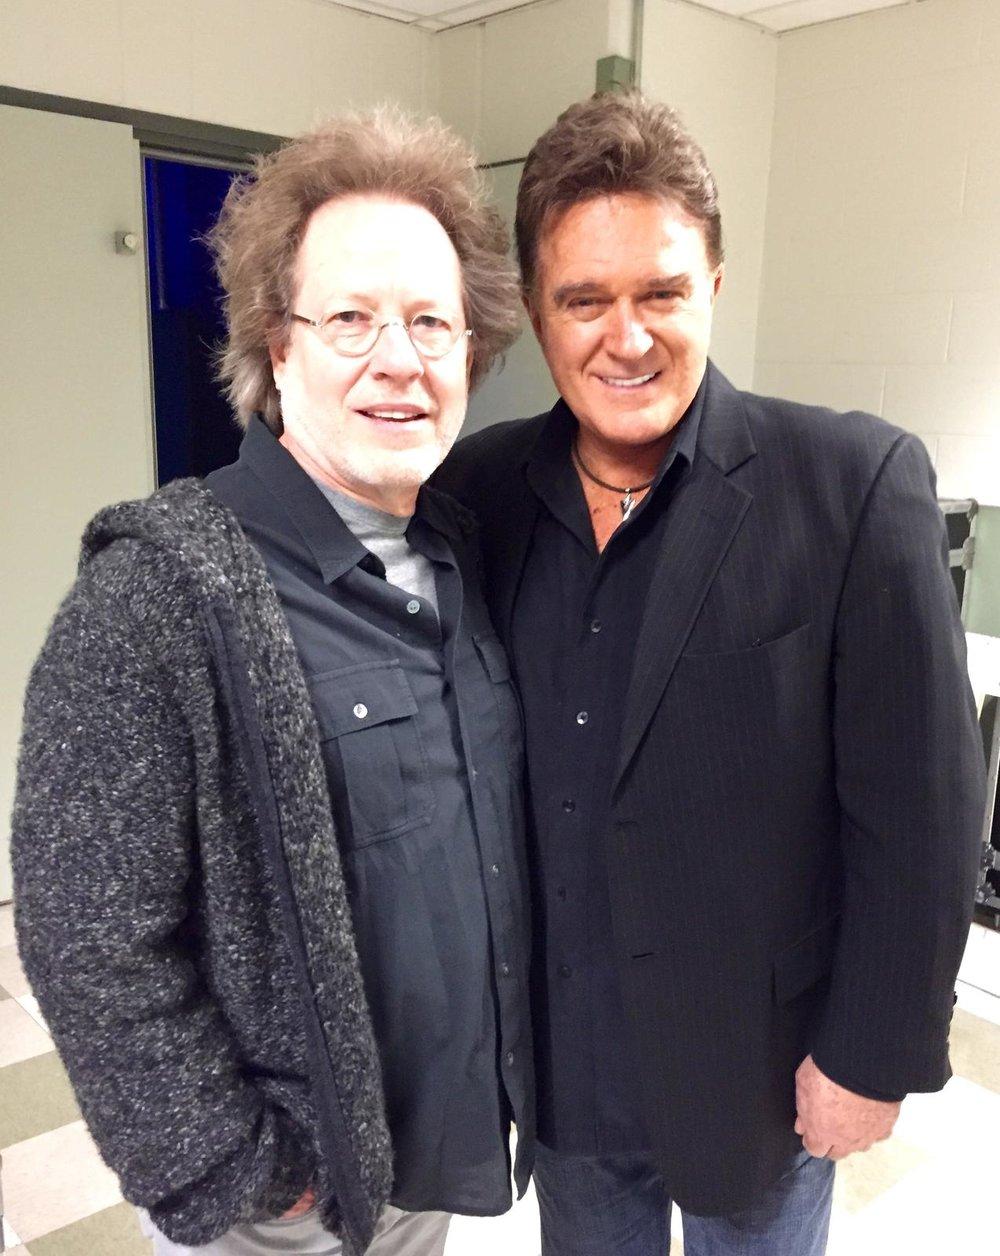 Steve & TG Sheppard